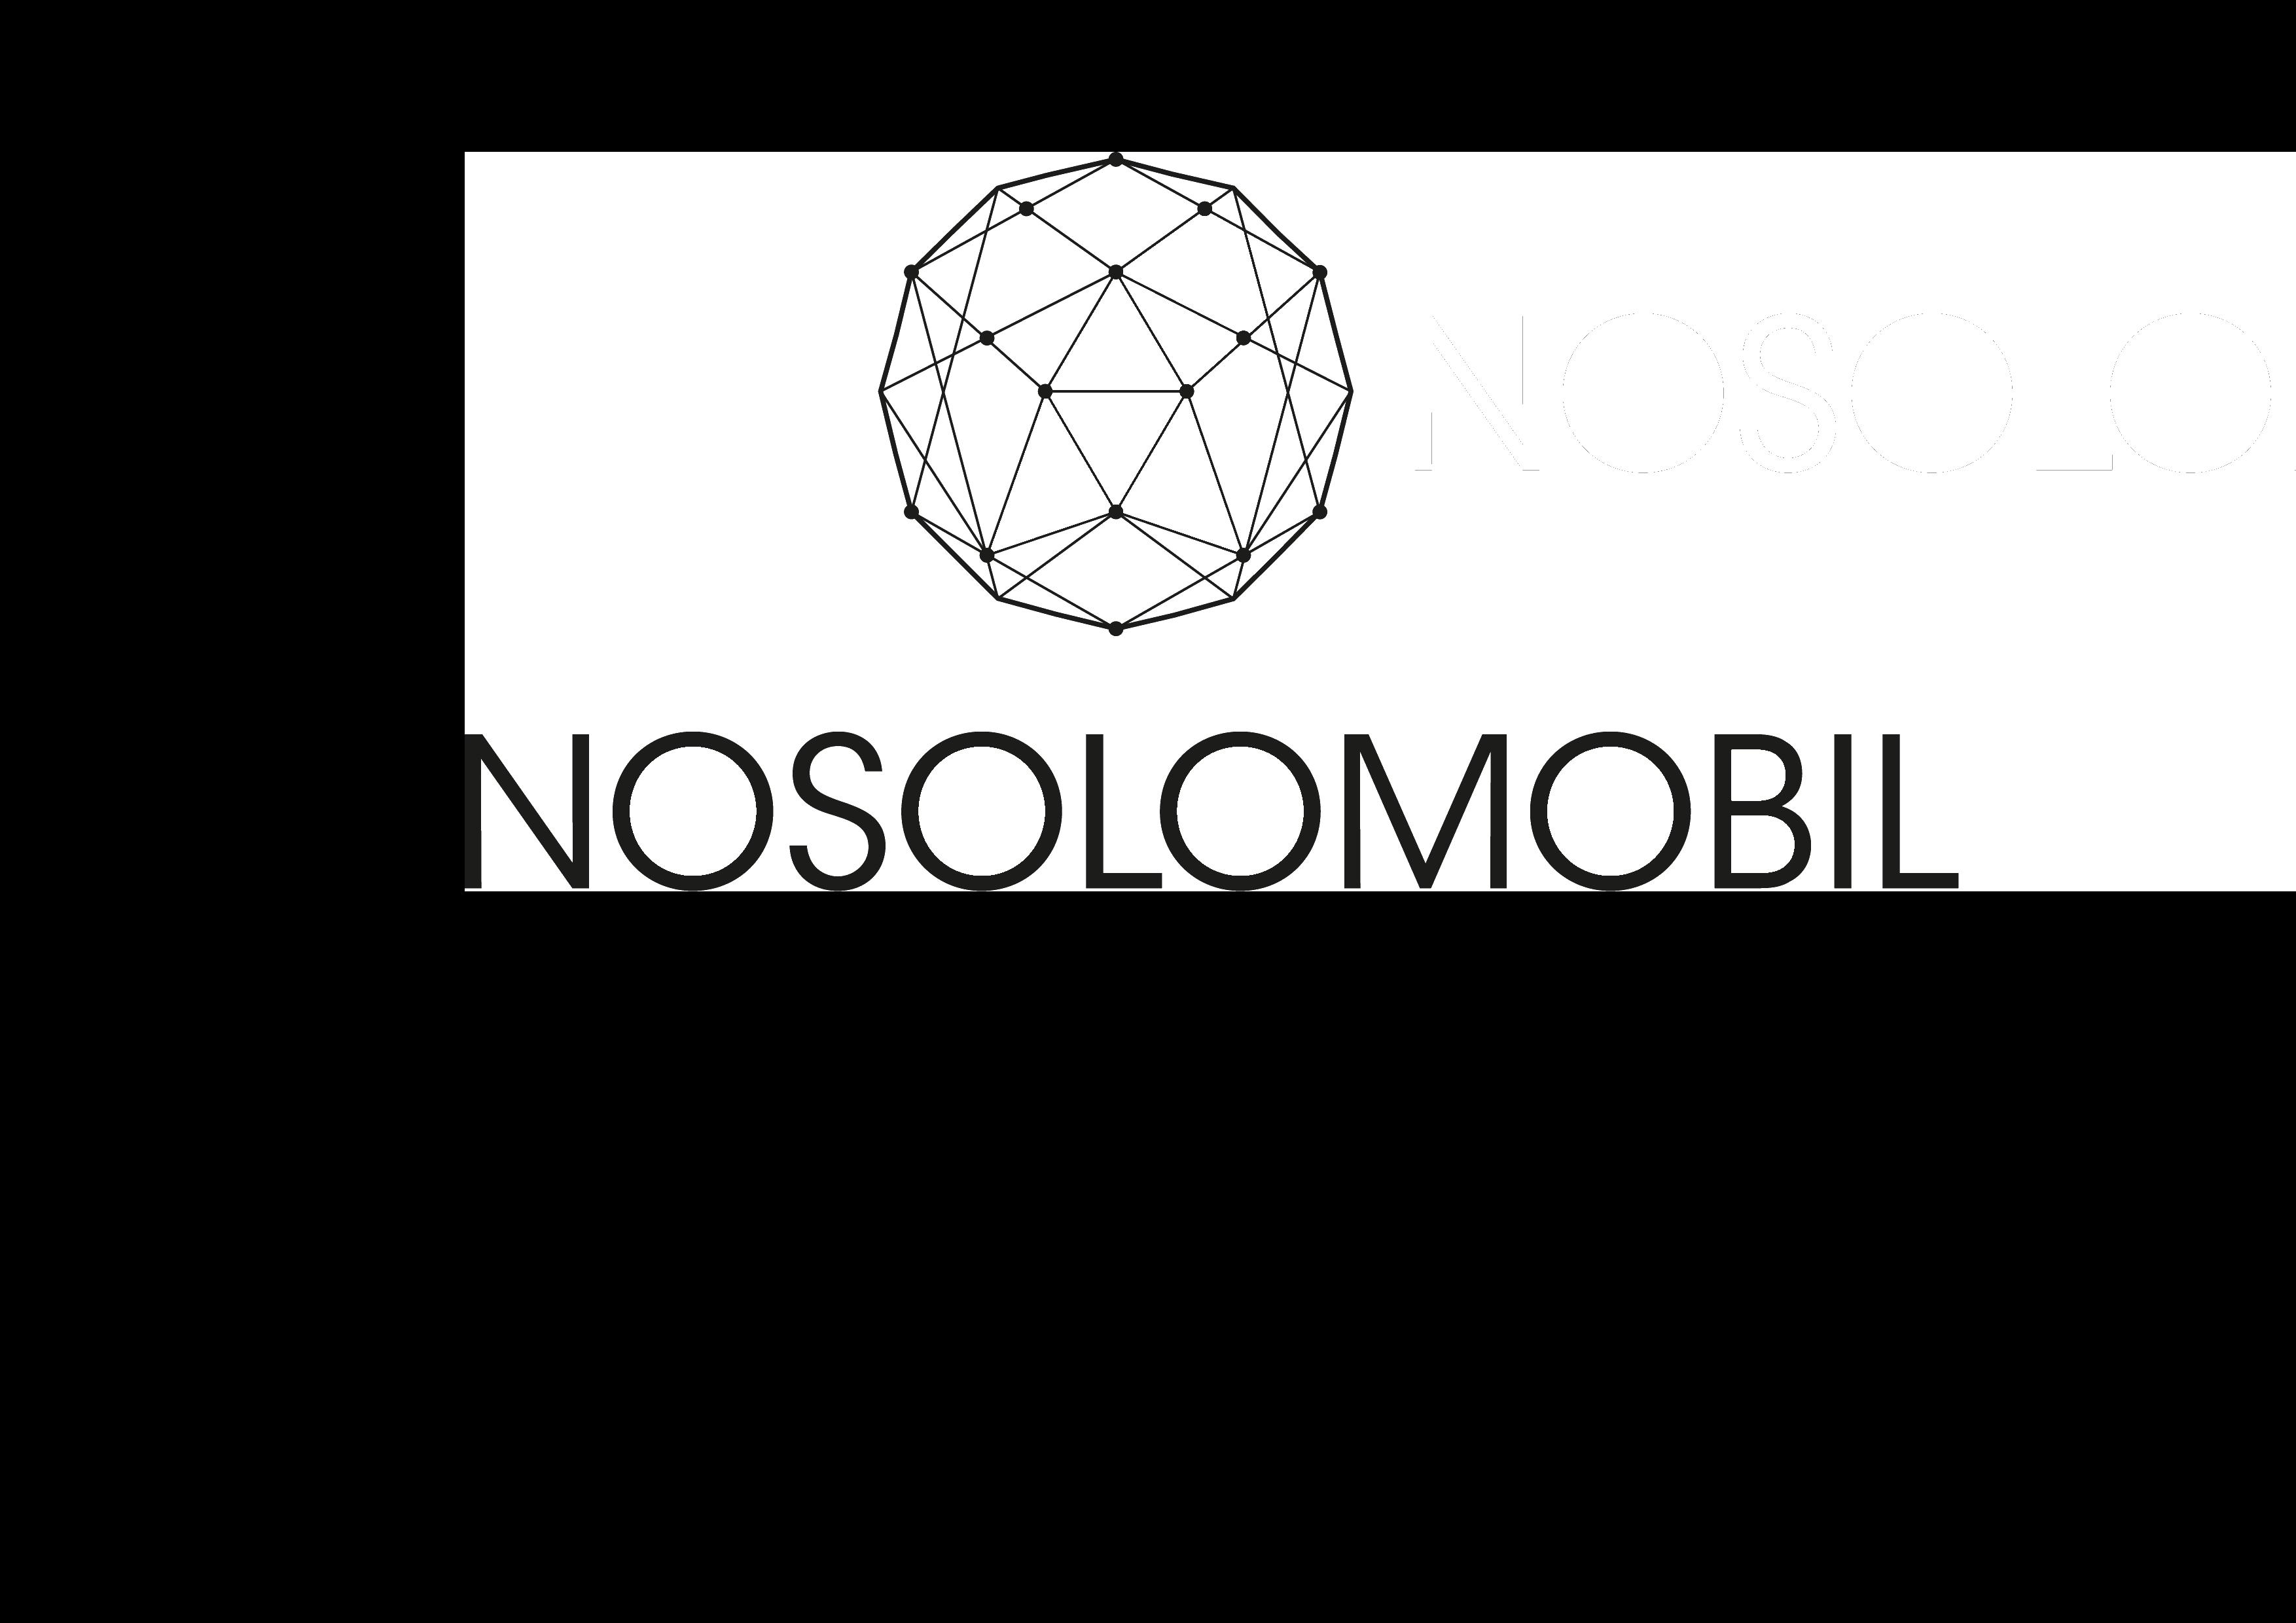 Nosolomobil